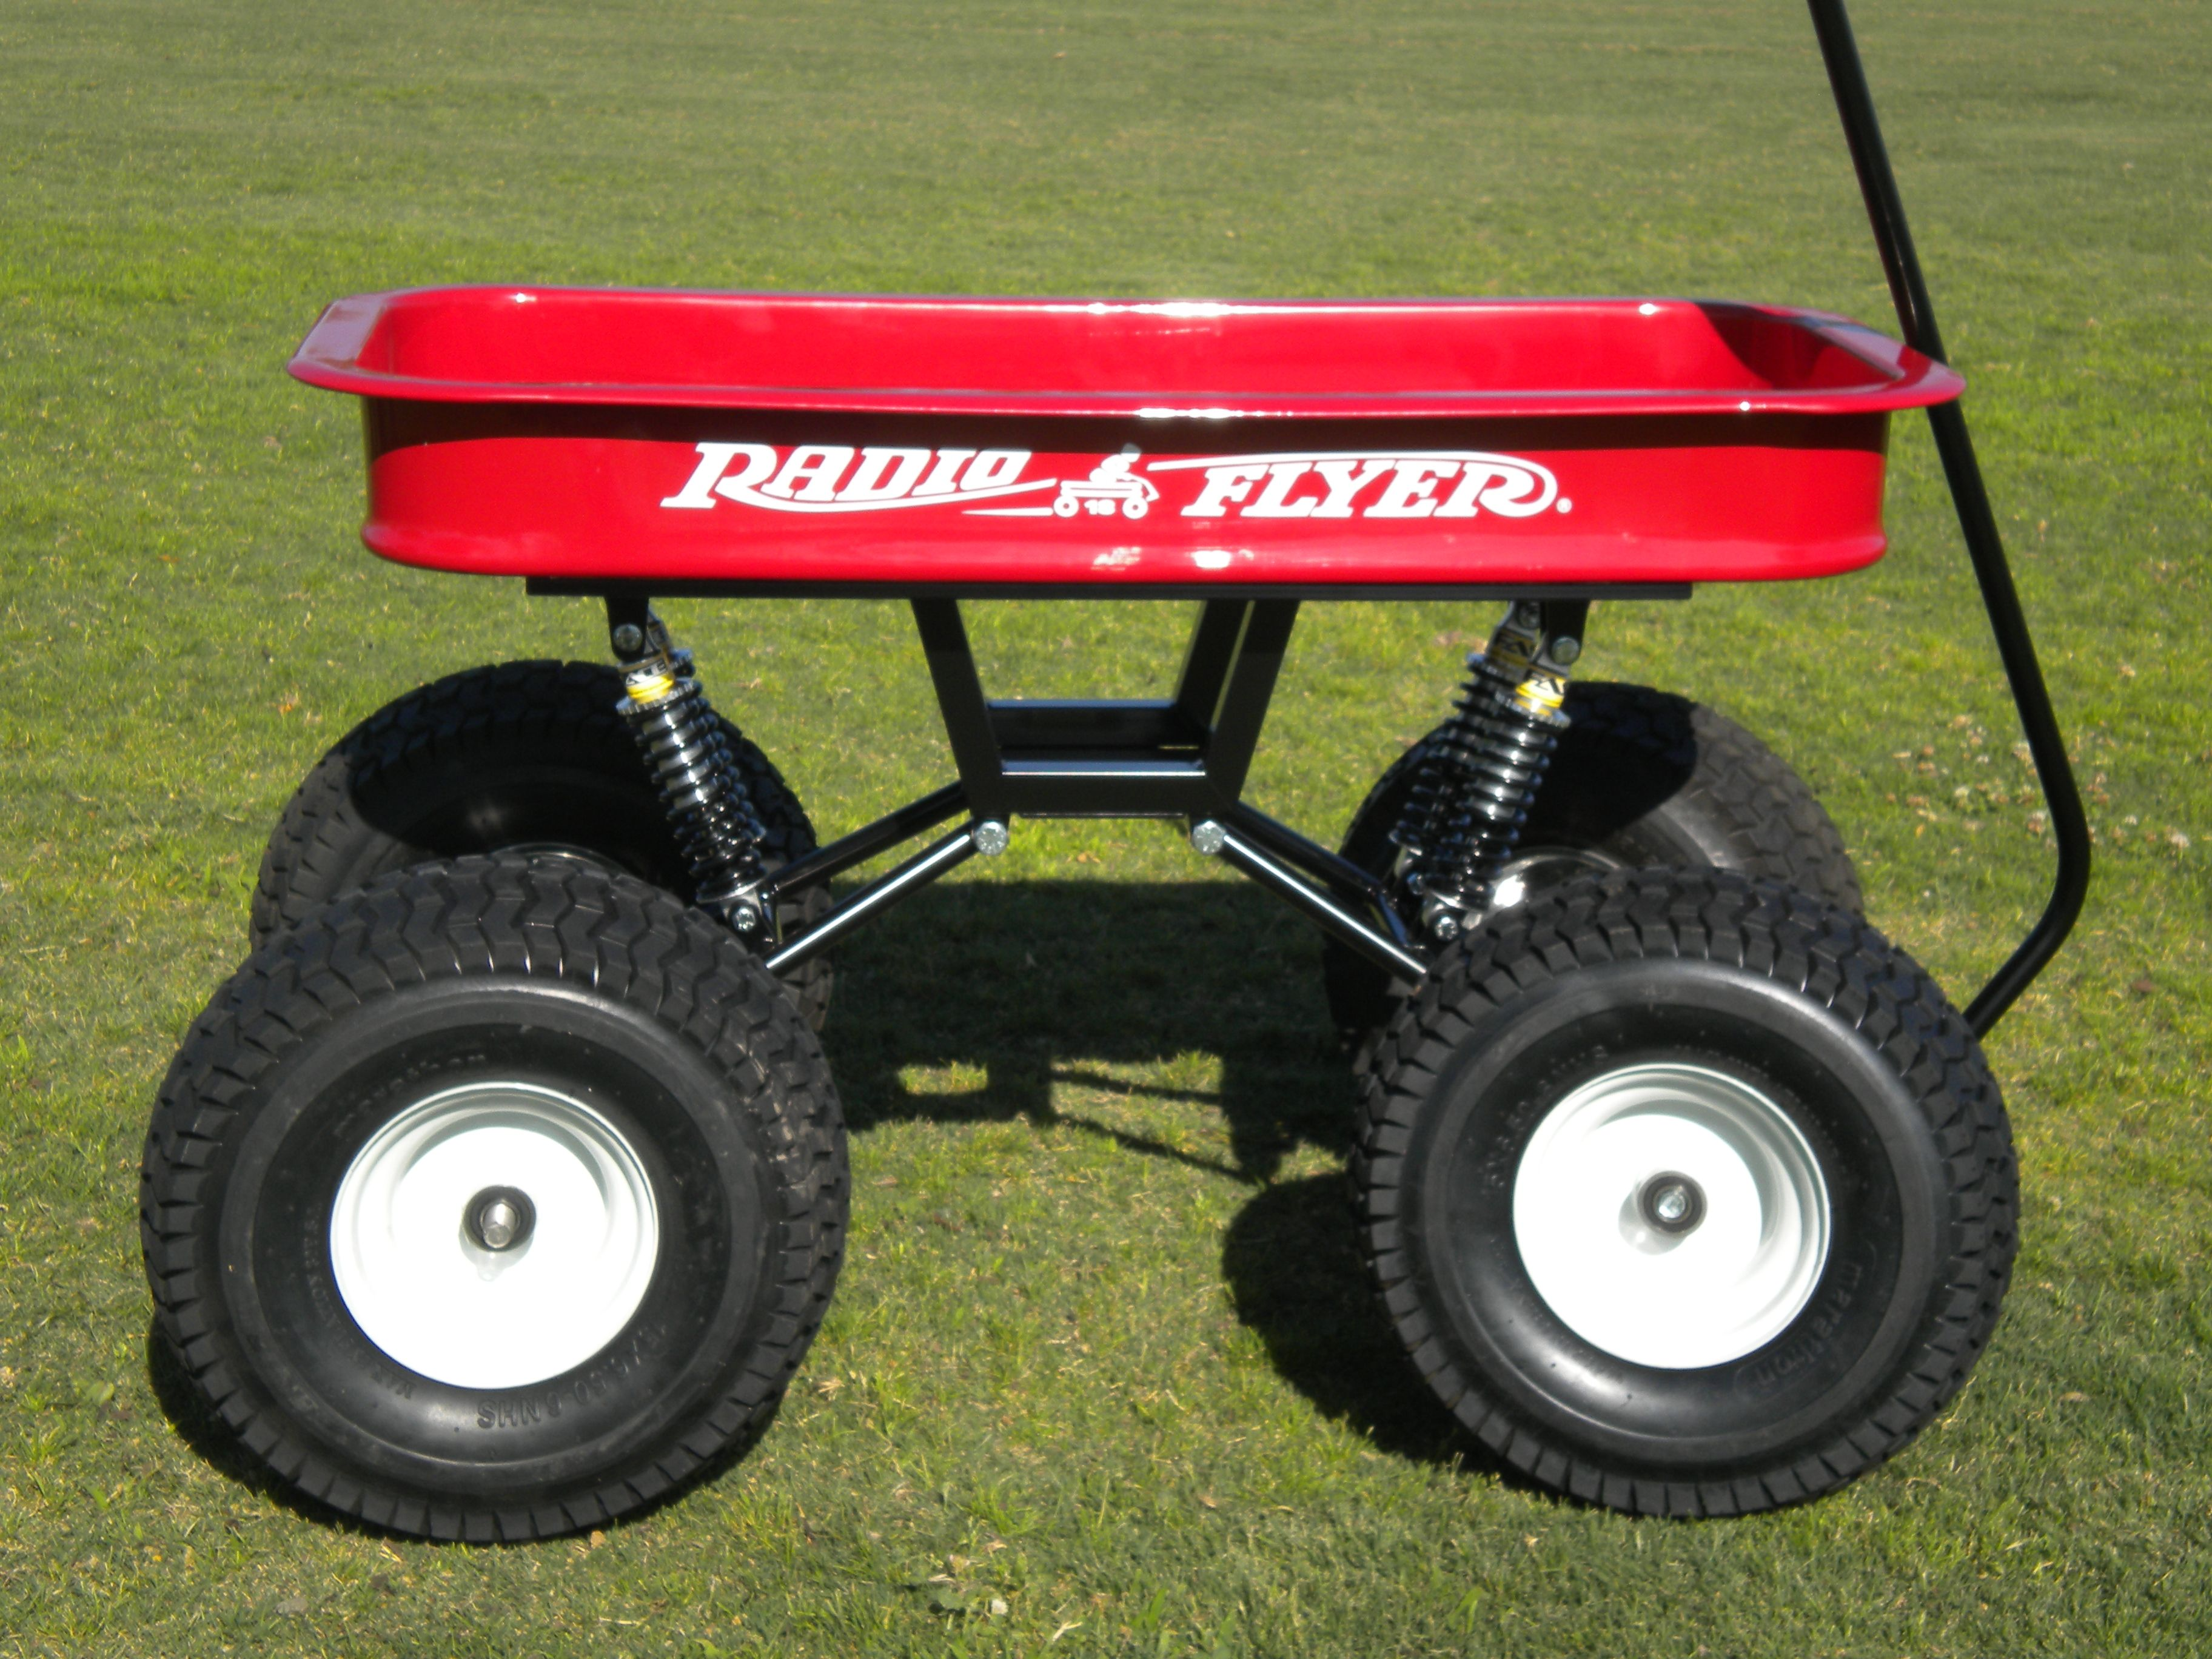 Custom Radio Flyer wagon with Swing-Arm suspension kit